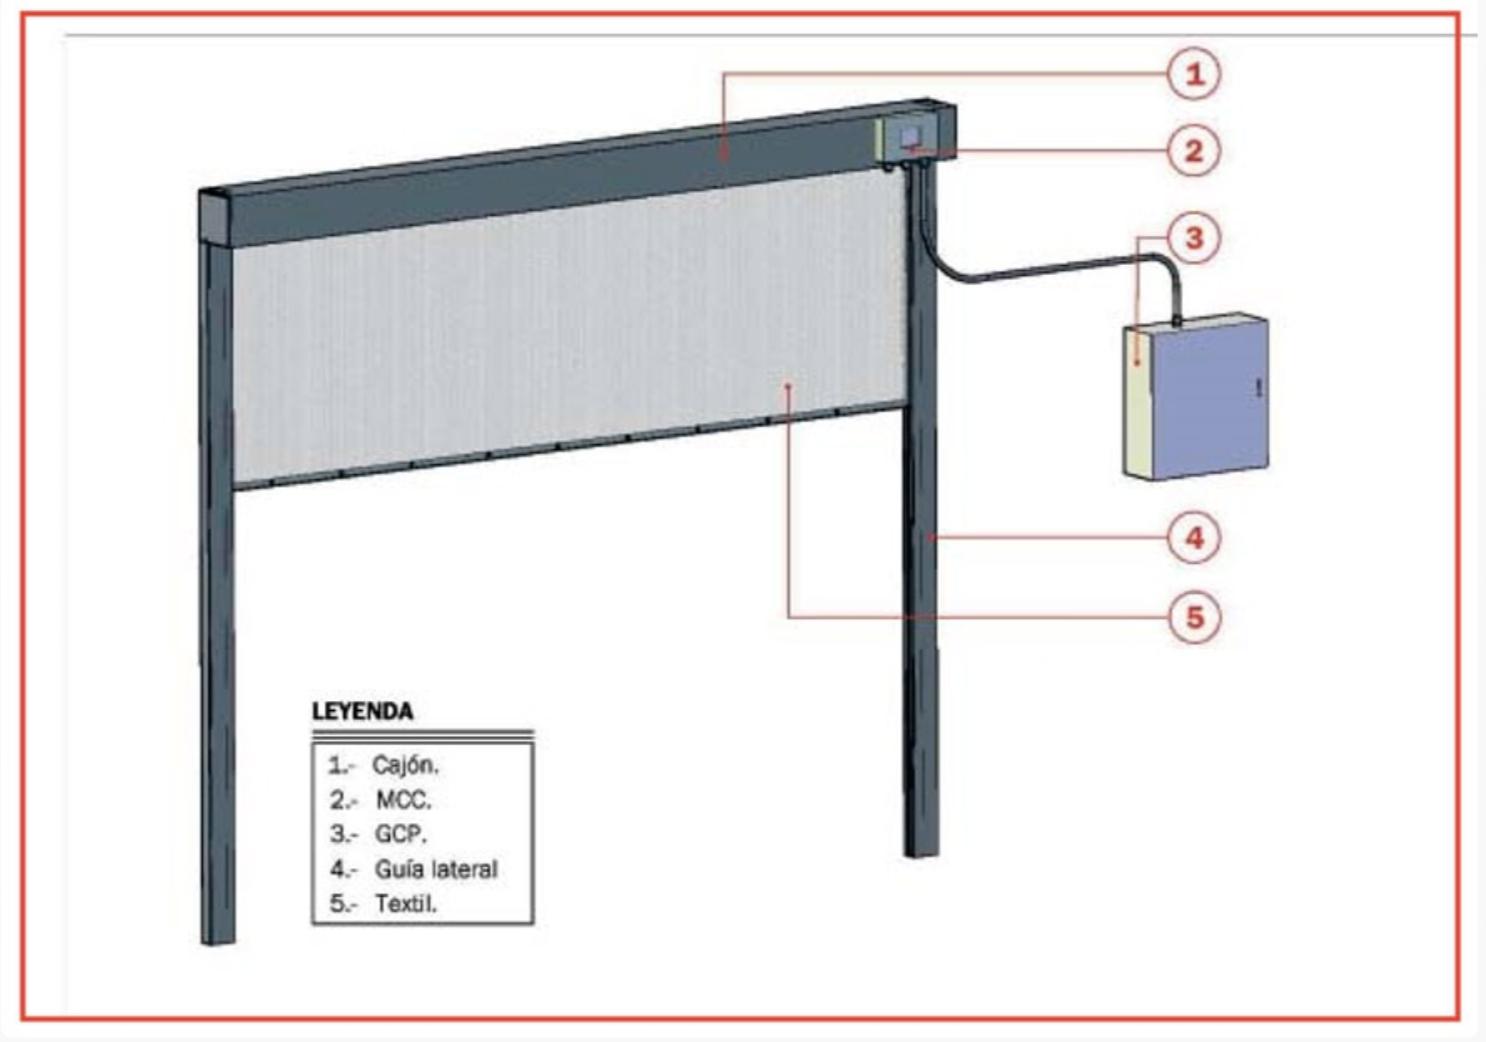 esquema partes cortina f120 synixtor